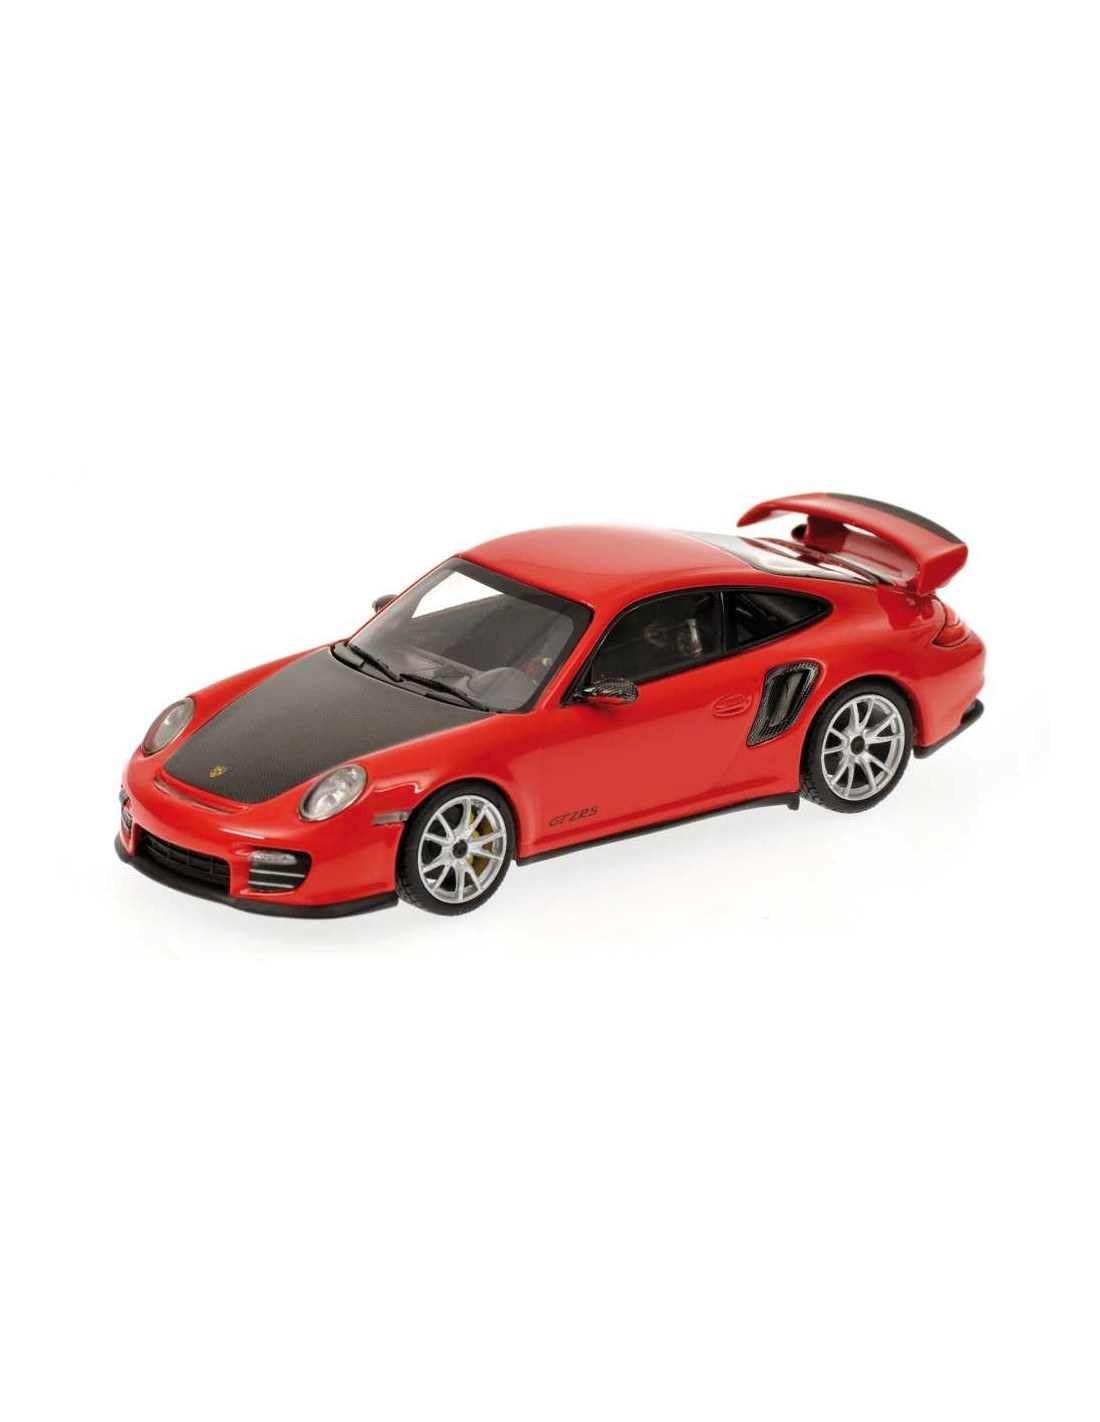 minichamps porsche 911 997 ii gt2 rs 2010 red w silver wheels. Black Bedroom Furniture Sets. Home Design Ideas